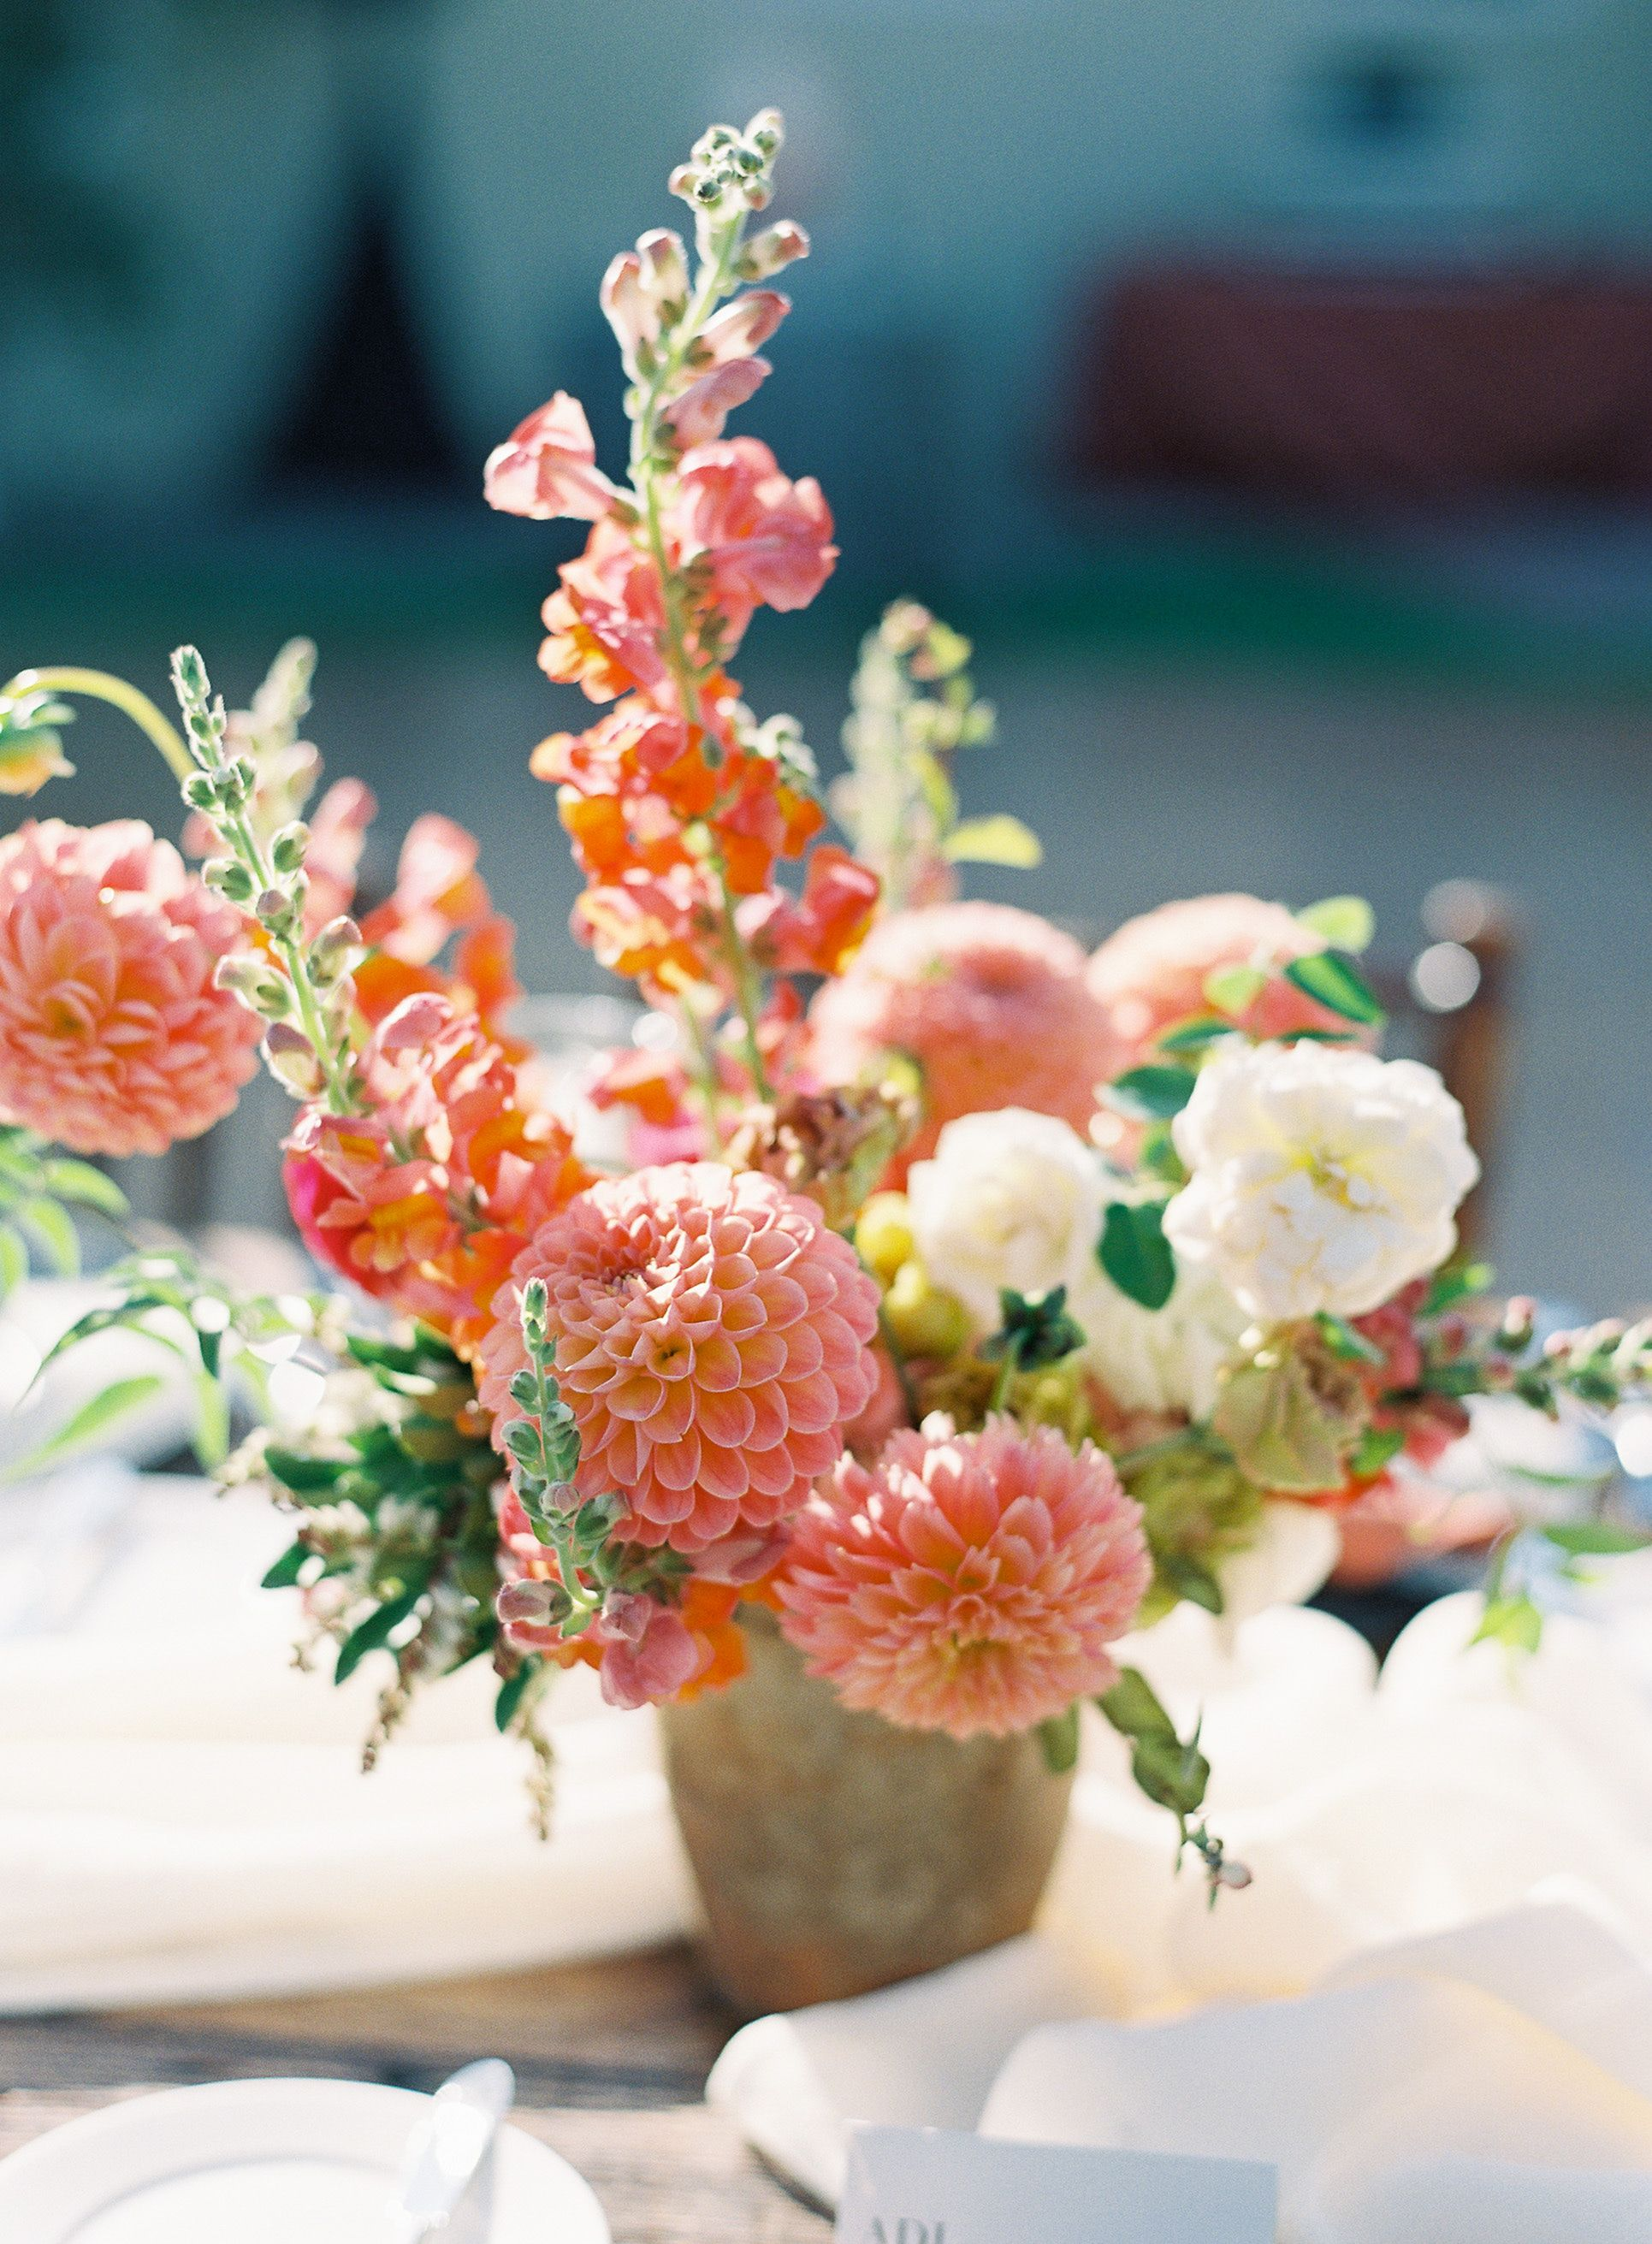 Peach Dahlia Arrangement In 2020 Dahlia Flower Arrangements Dahlias Wedding Wedding Flower Arrangements